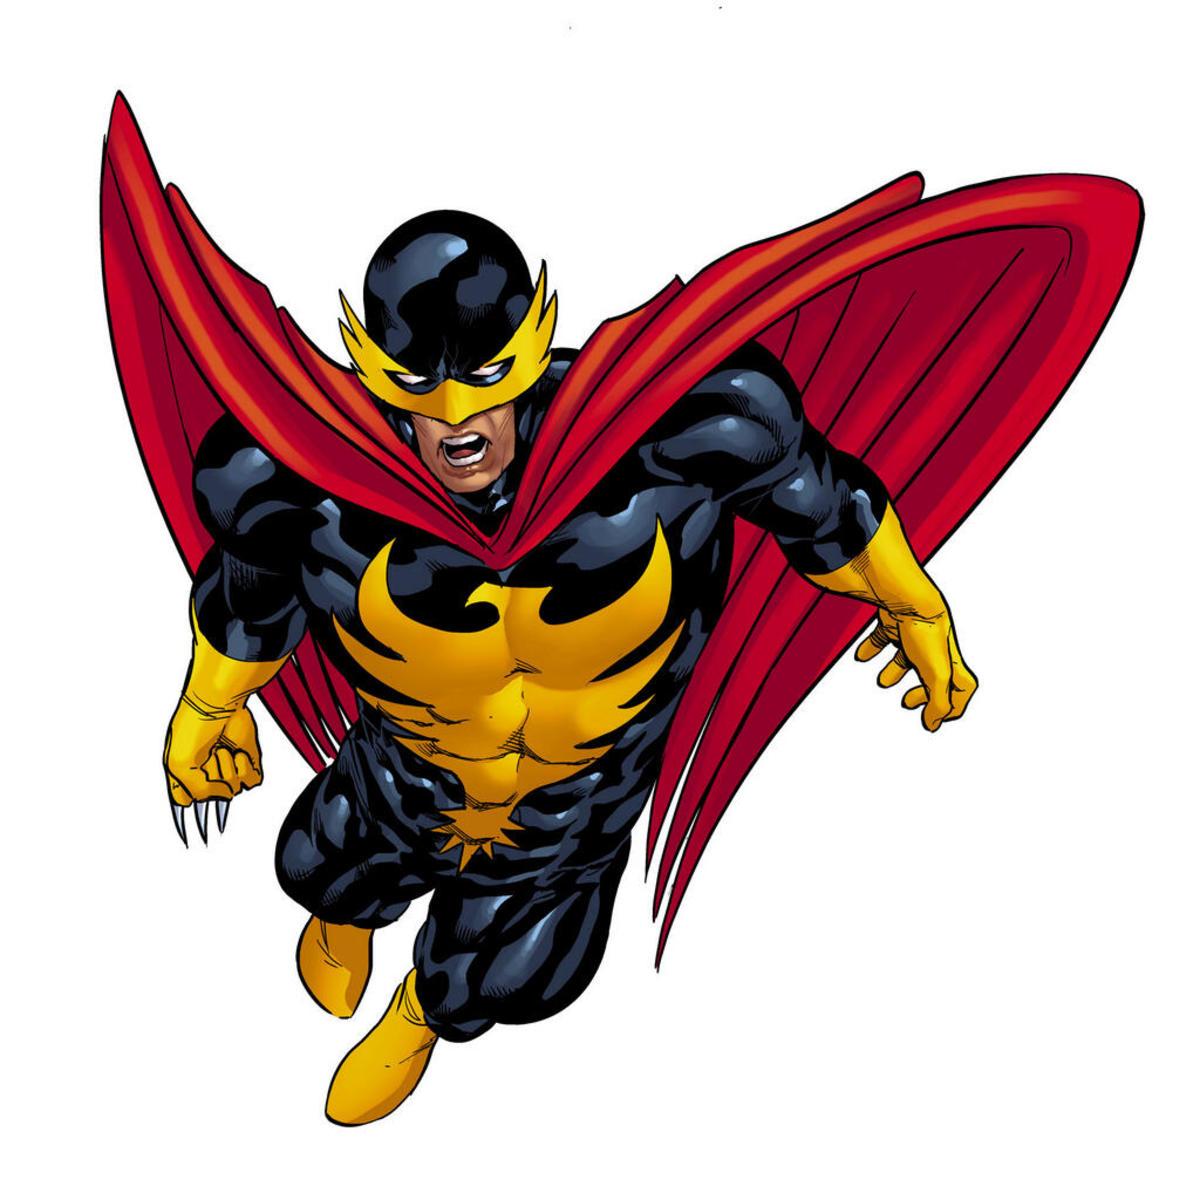 Nighthawk -  Kyle Richmond, Marvel's Bruce Wayne